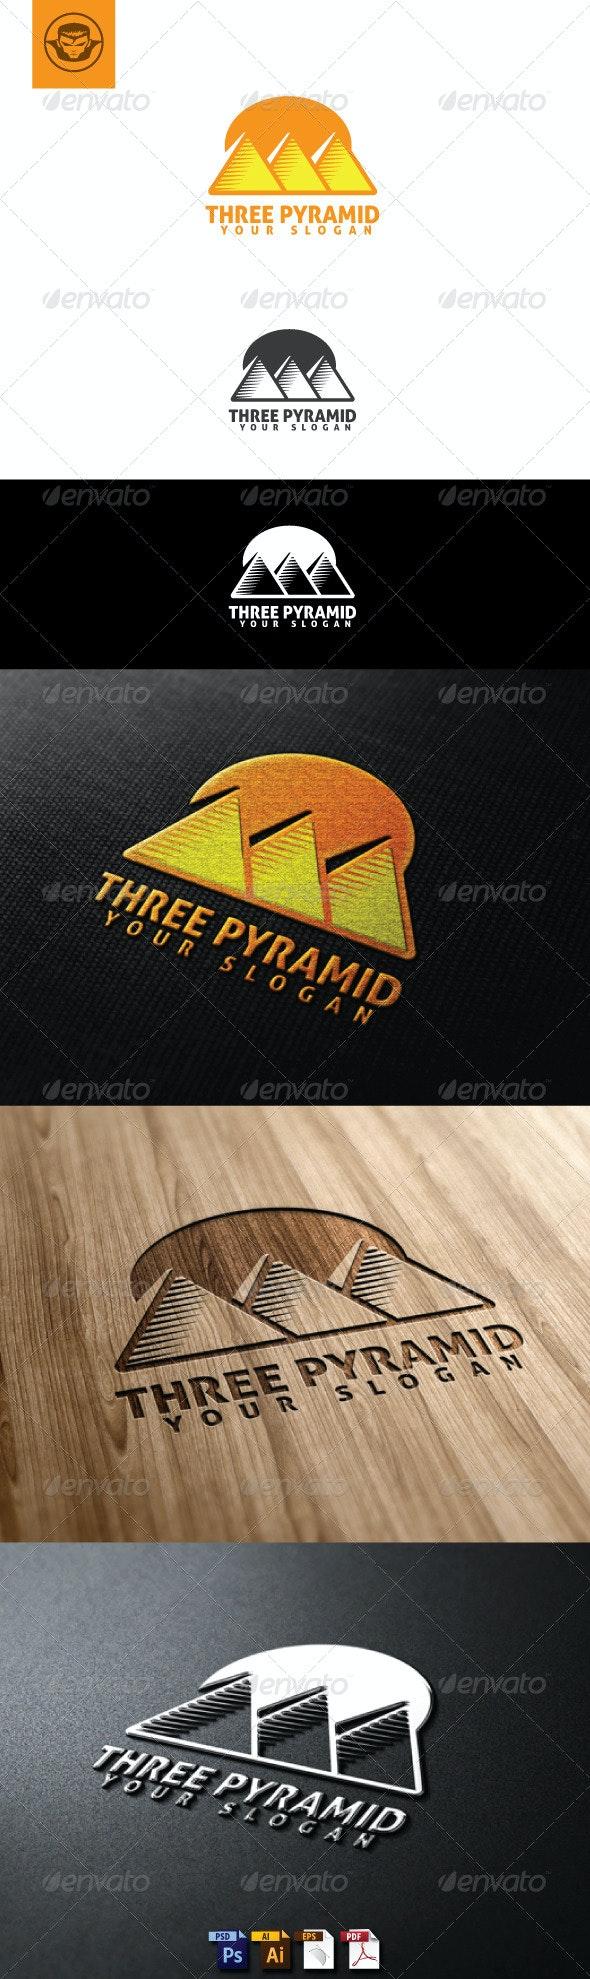 Three Pyramid Logo Template